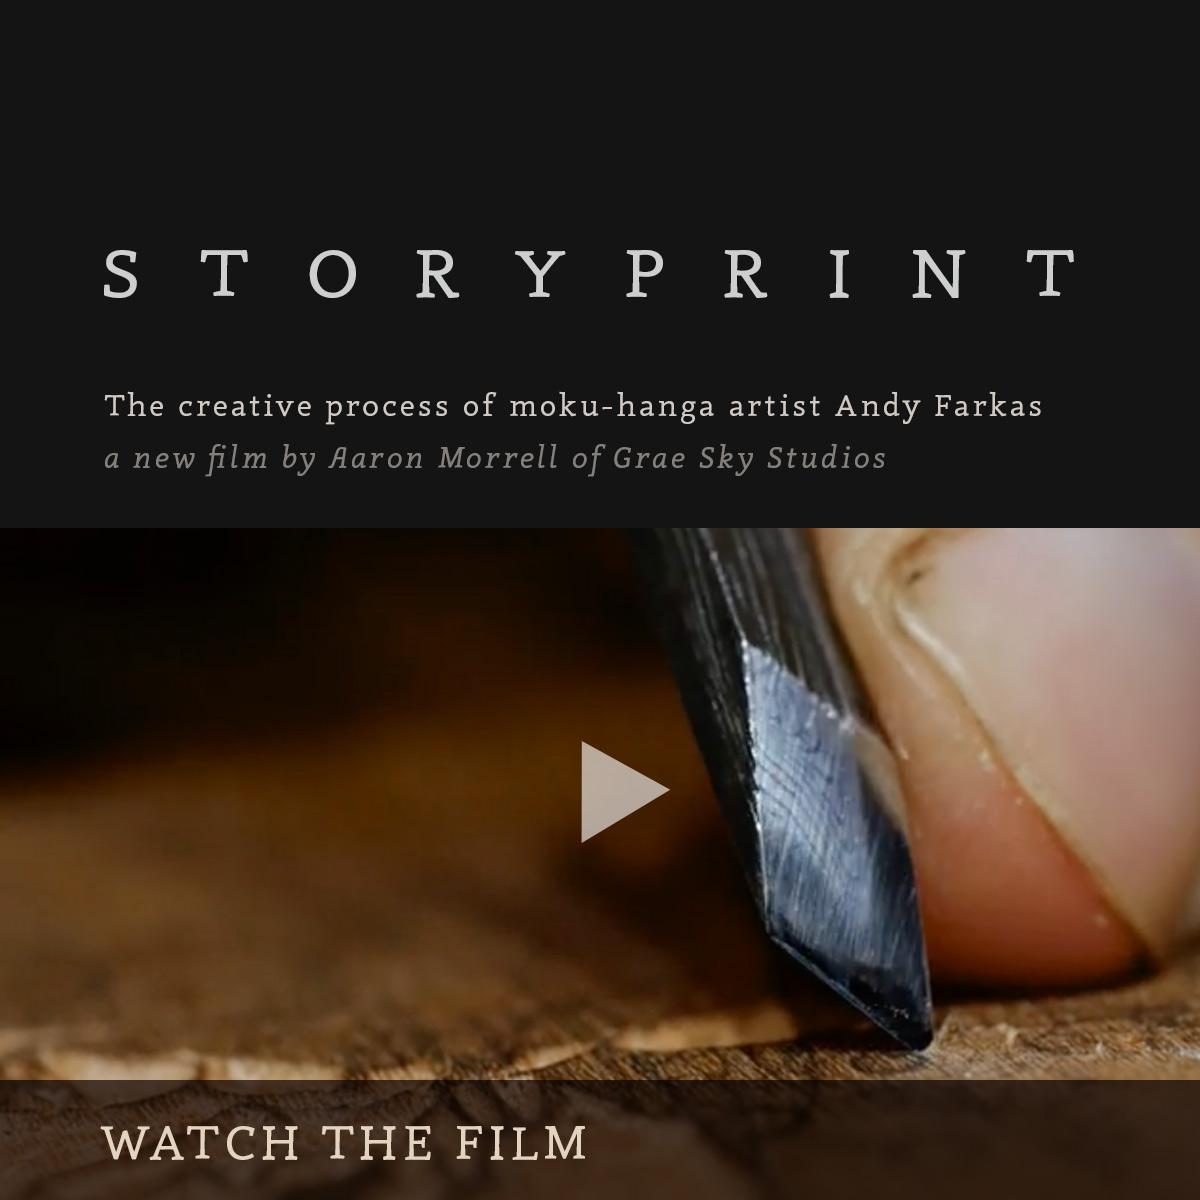 EmailFeatureImage-StoryprintFilm